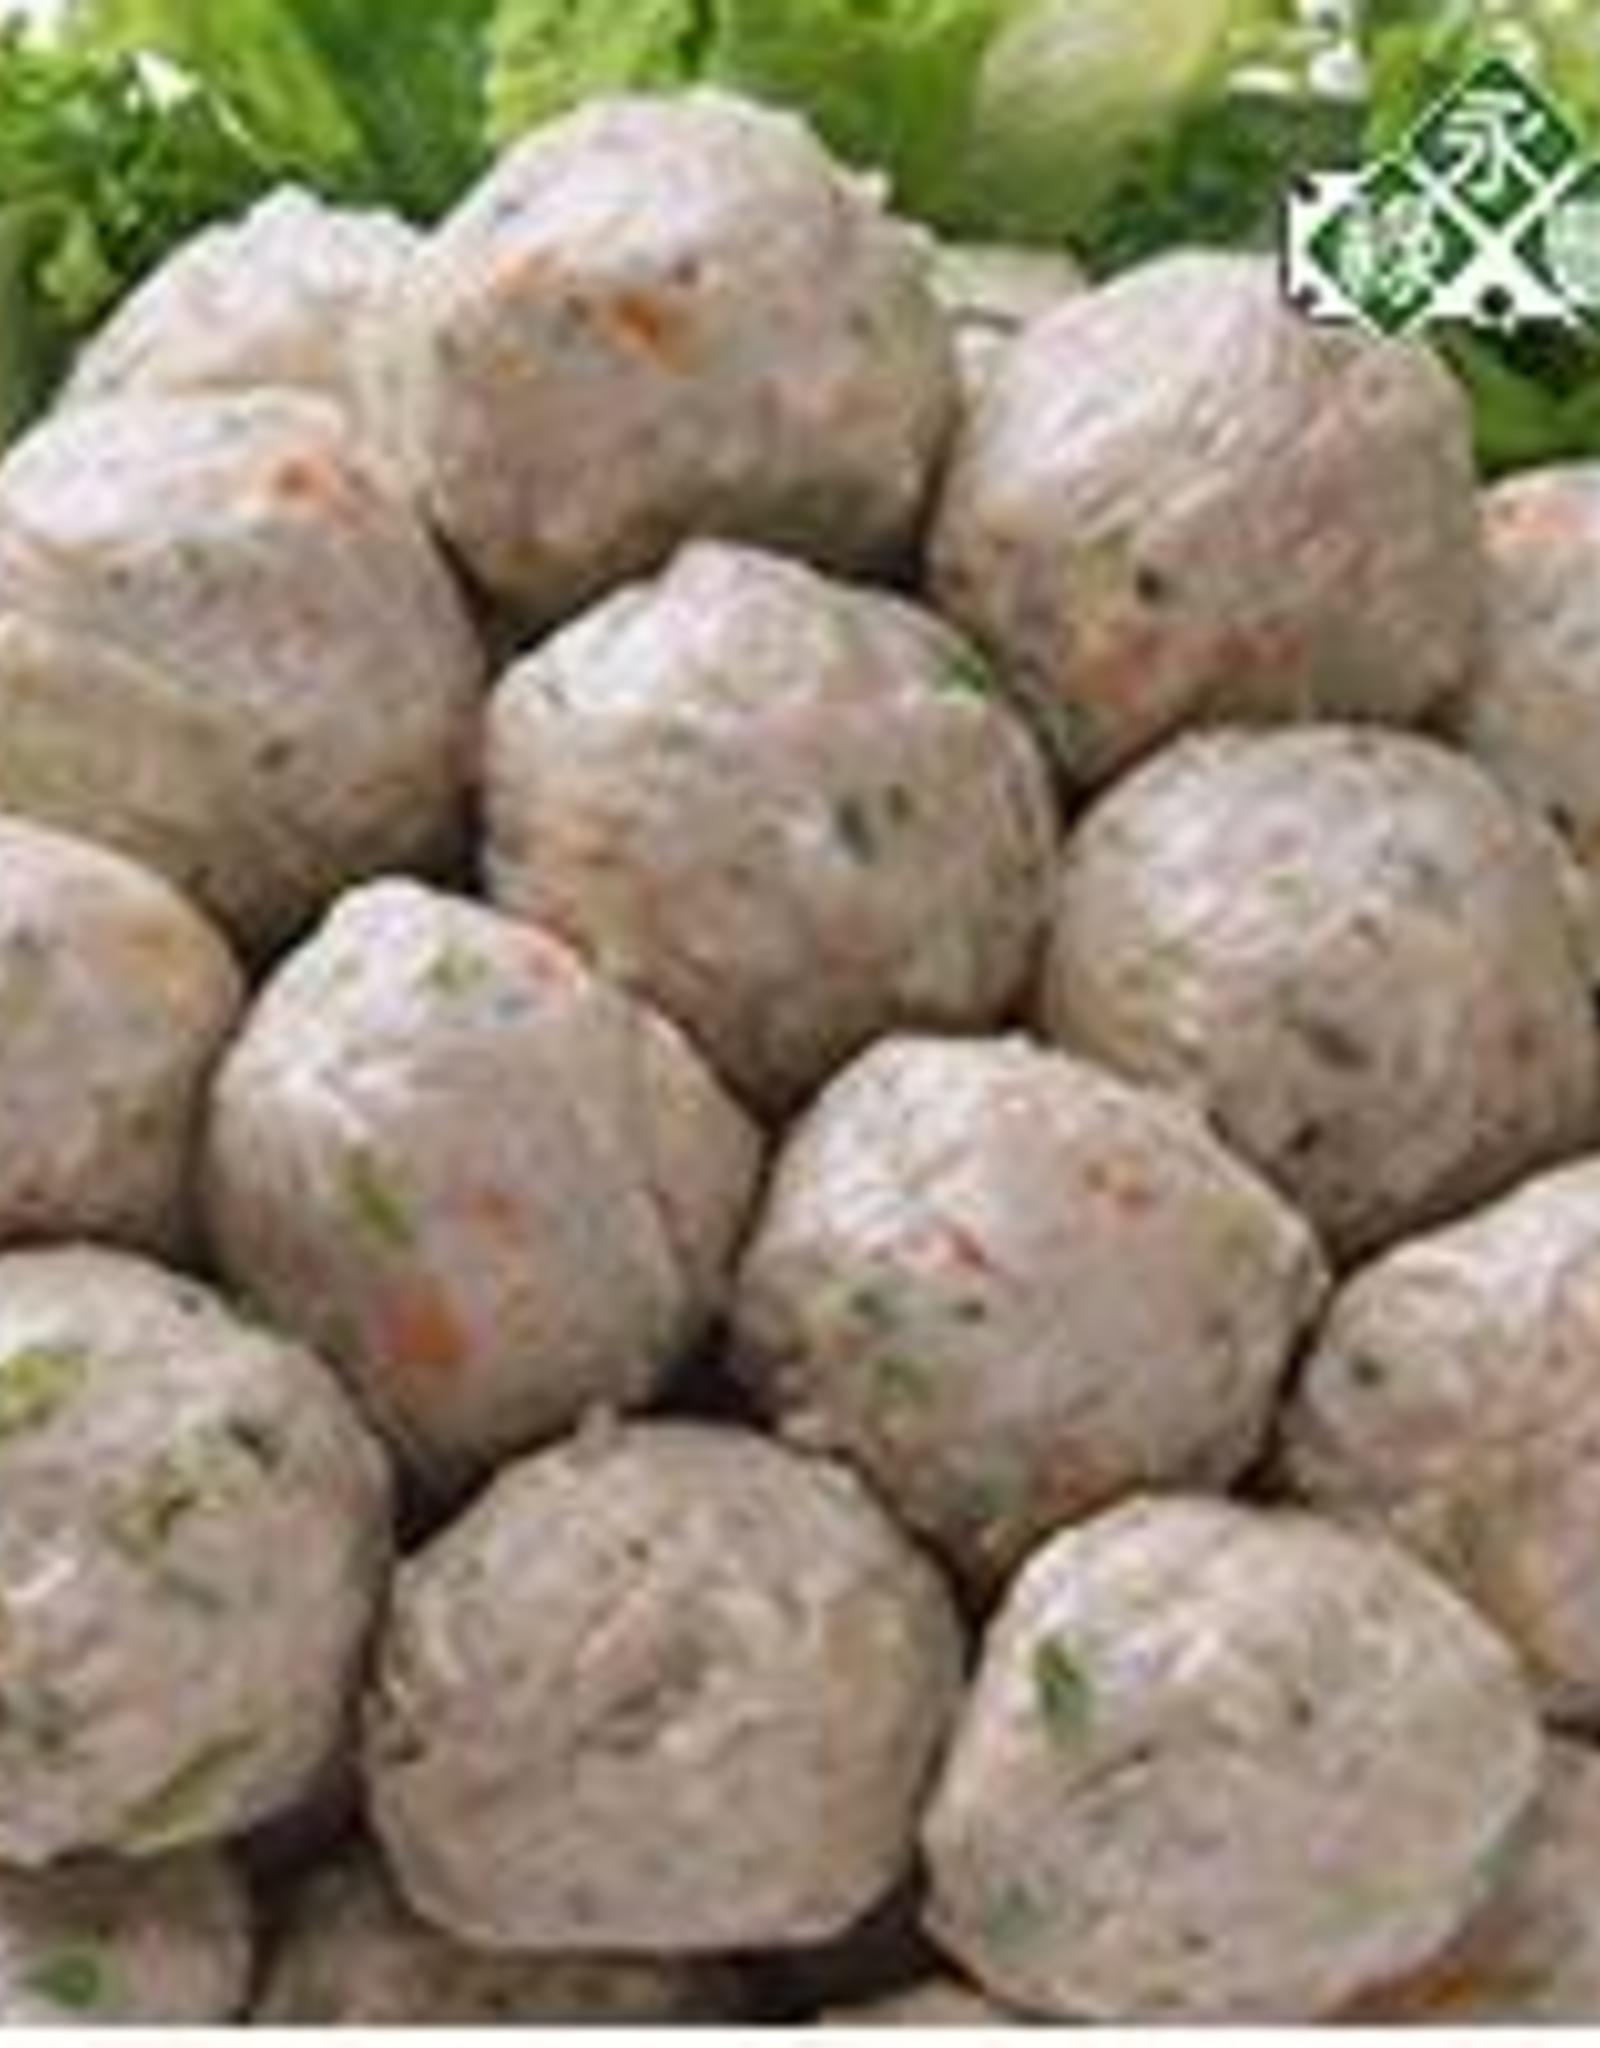 Forever Health * 永祿豐 (FH) Vegan Vegetable Ball (S)*(永祿豐) 什錦丸 (S)